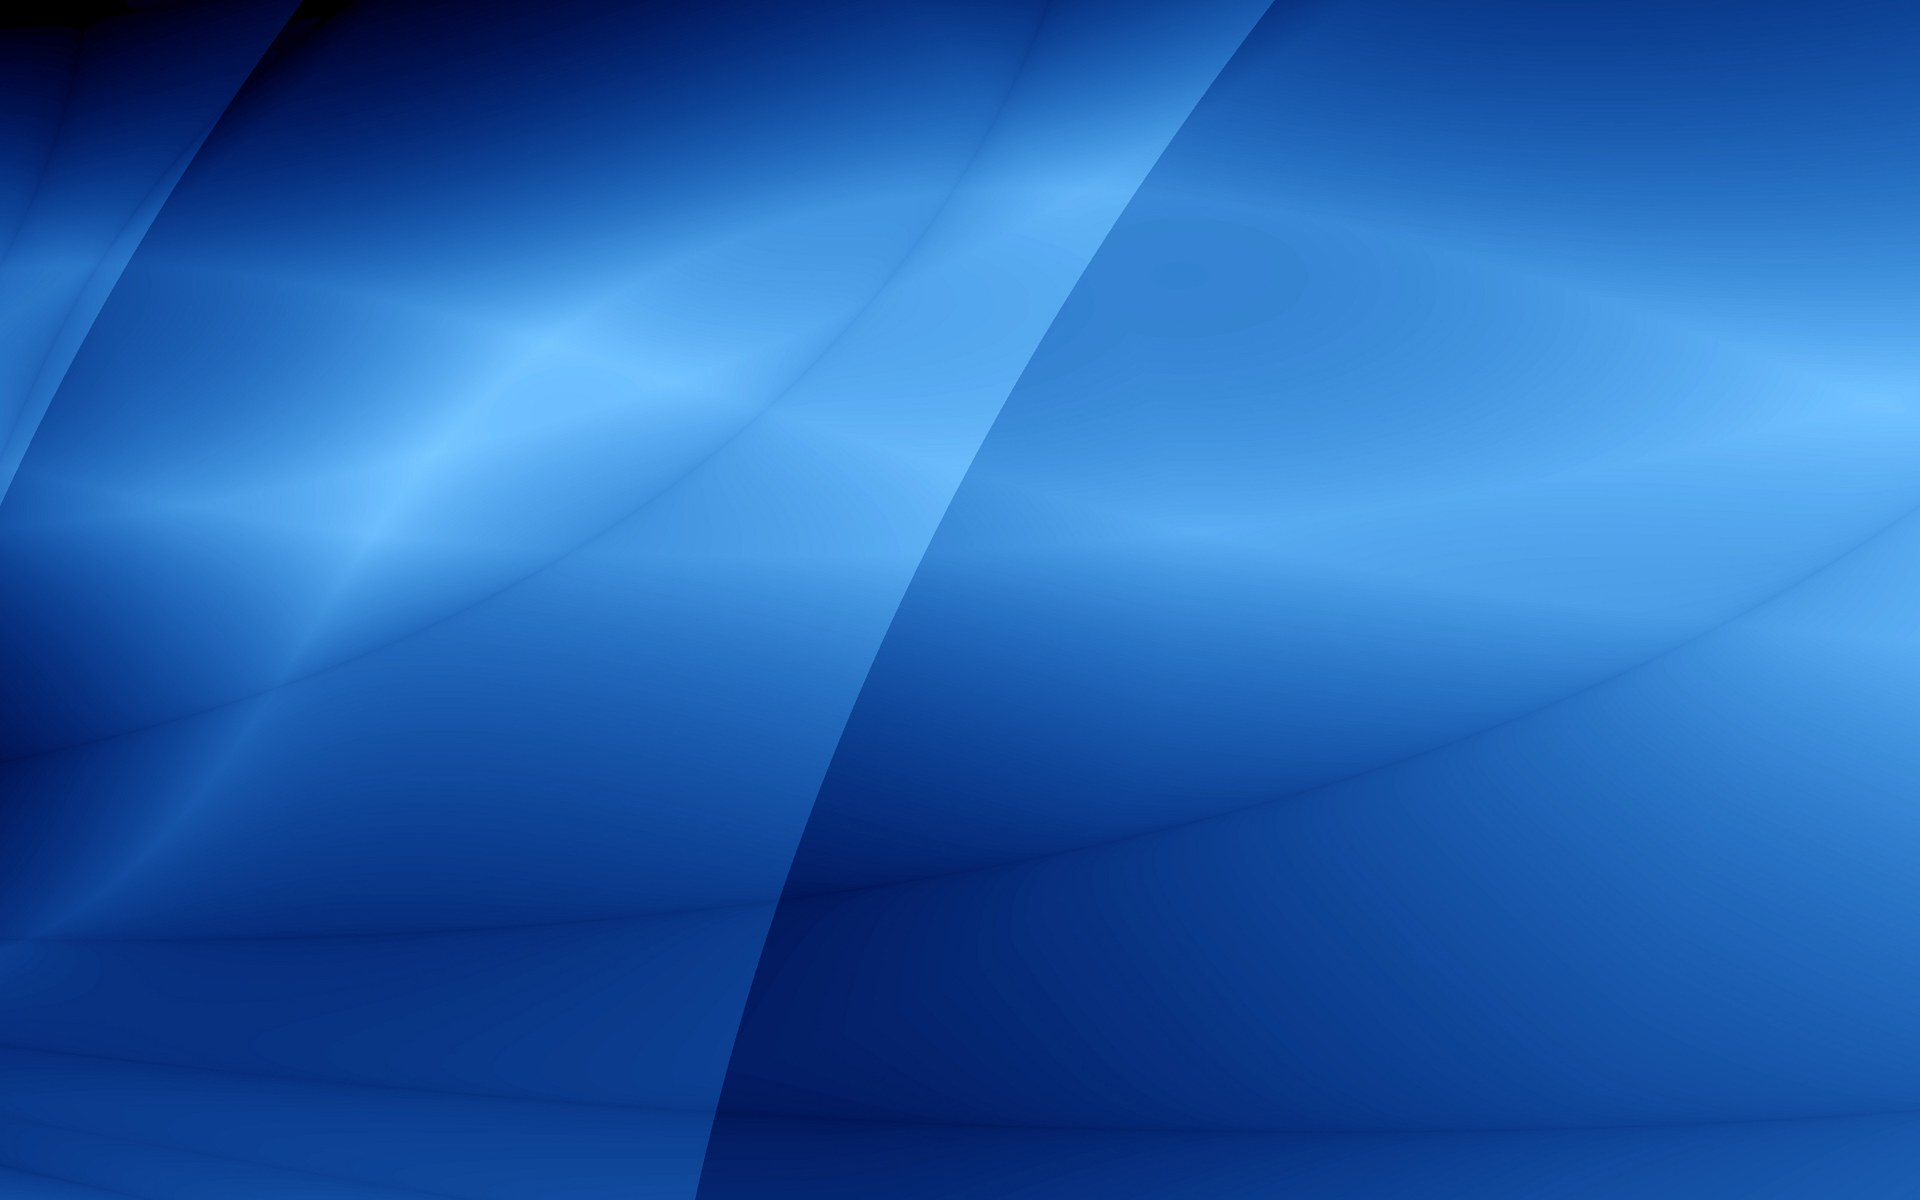 2009 wallpaper background image blue 1920x1200